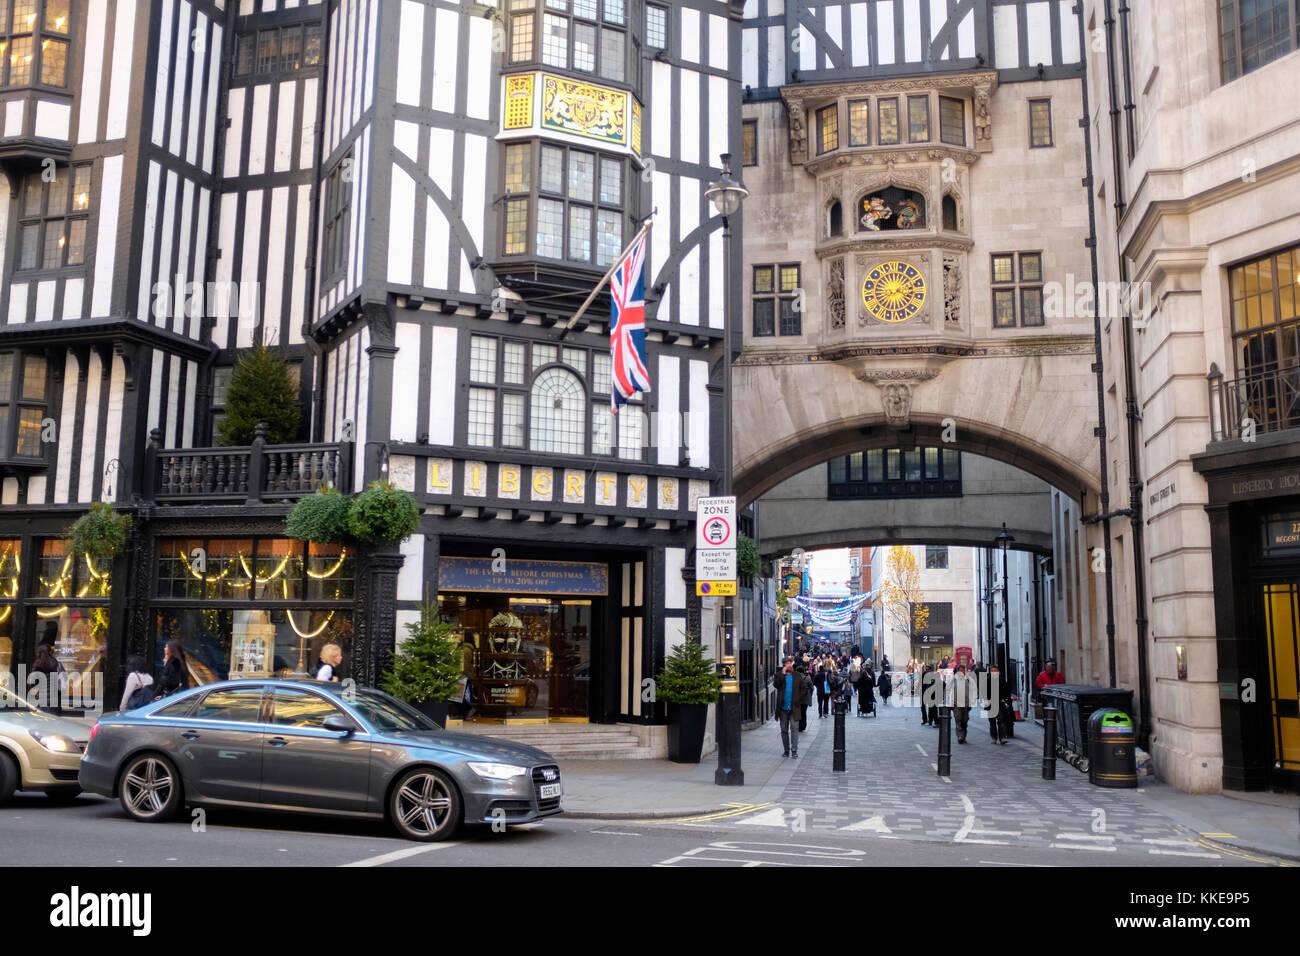 Liberty department store, London - Stock Image